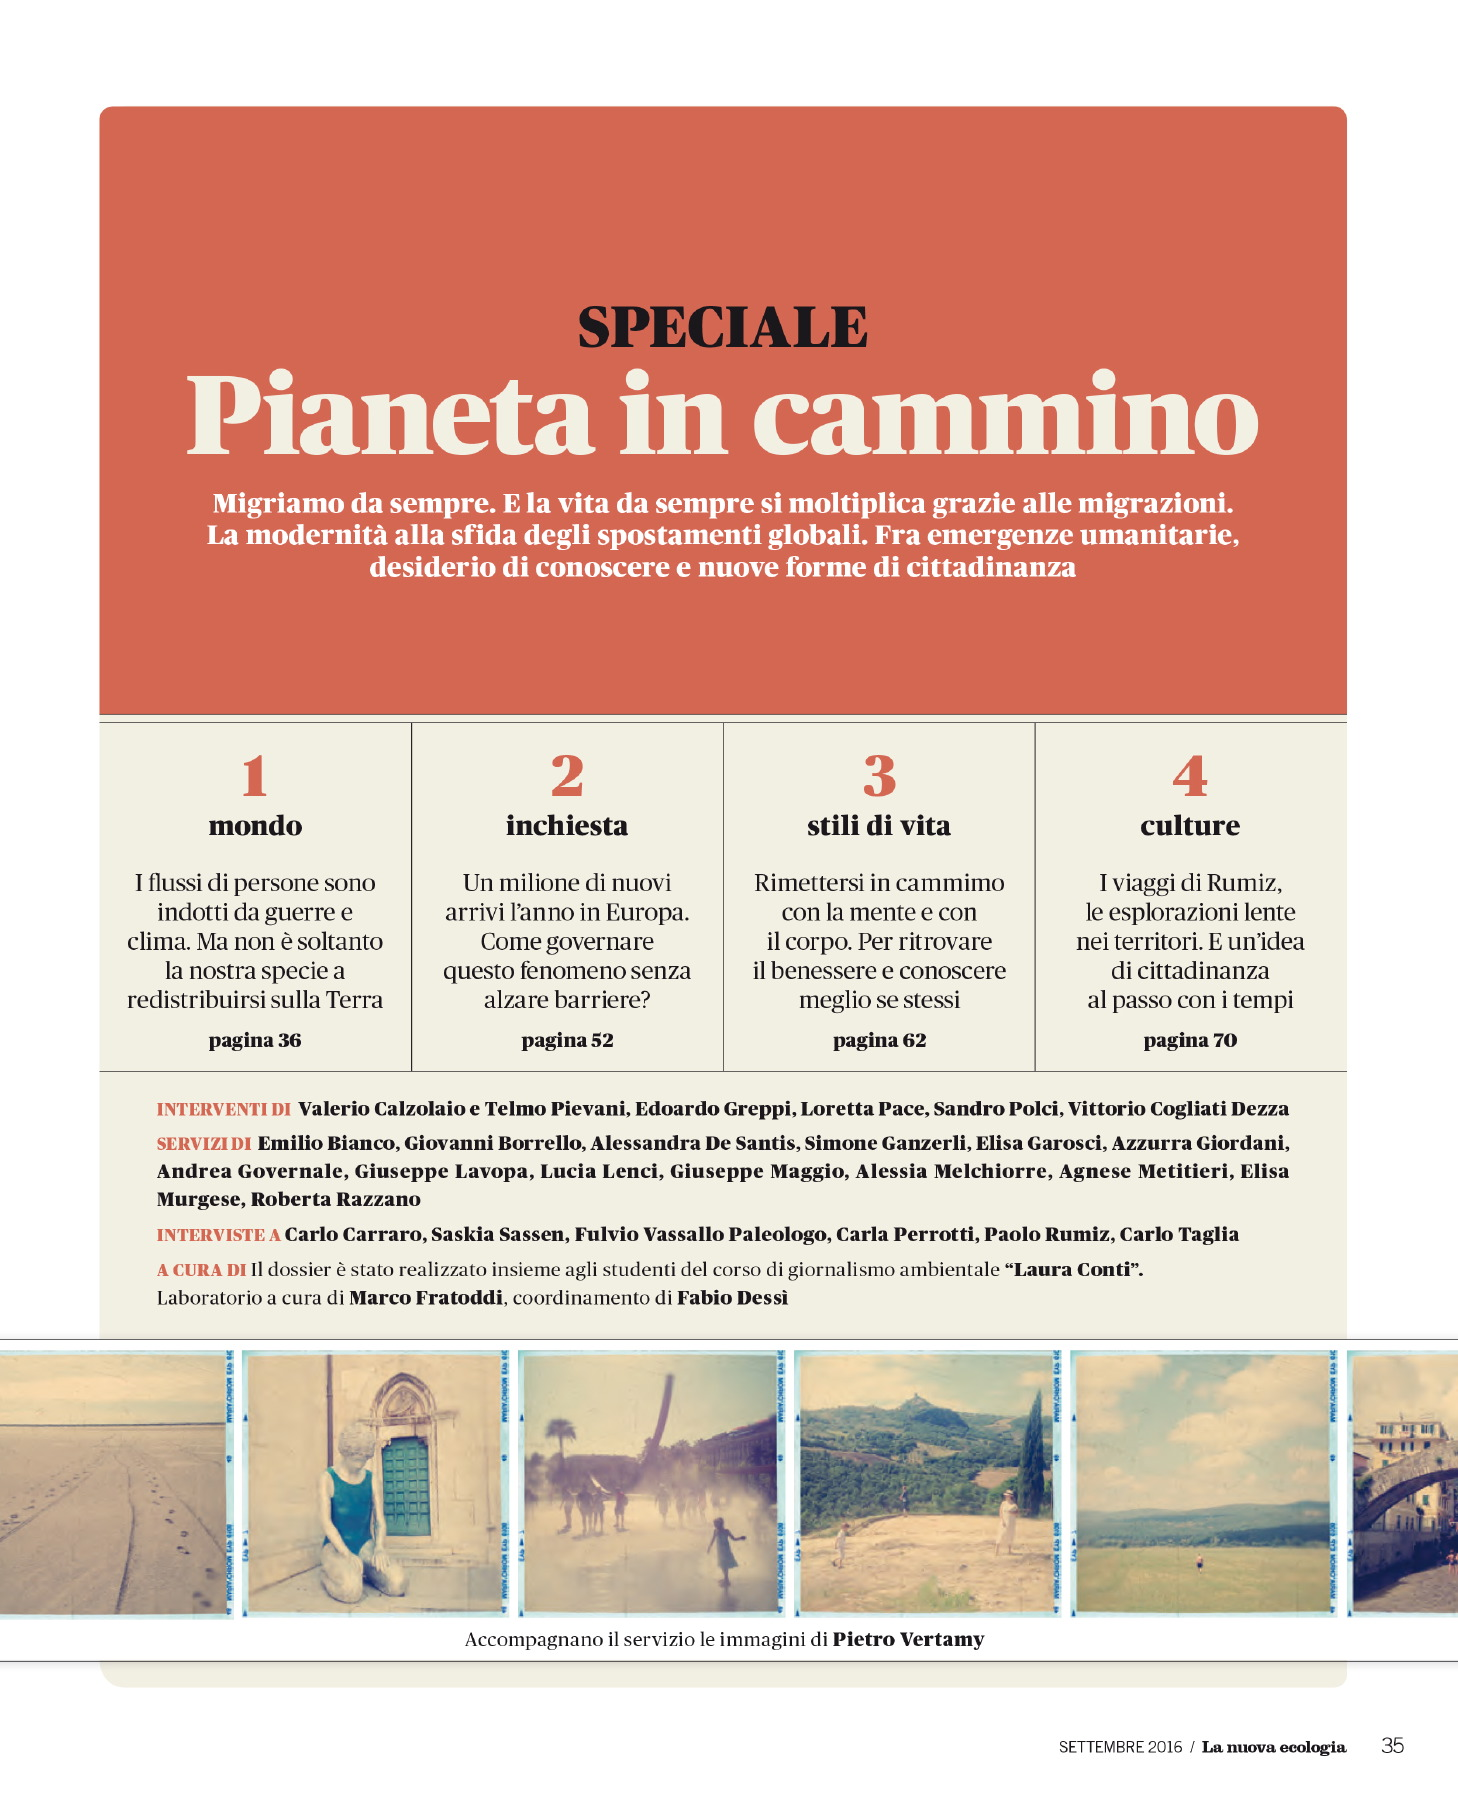 around-the-walk-_-pietro-vertamy-_tearsheet-nuova-ecologia-01